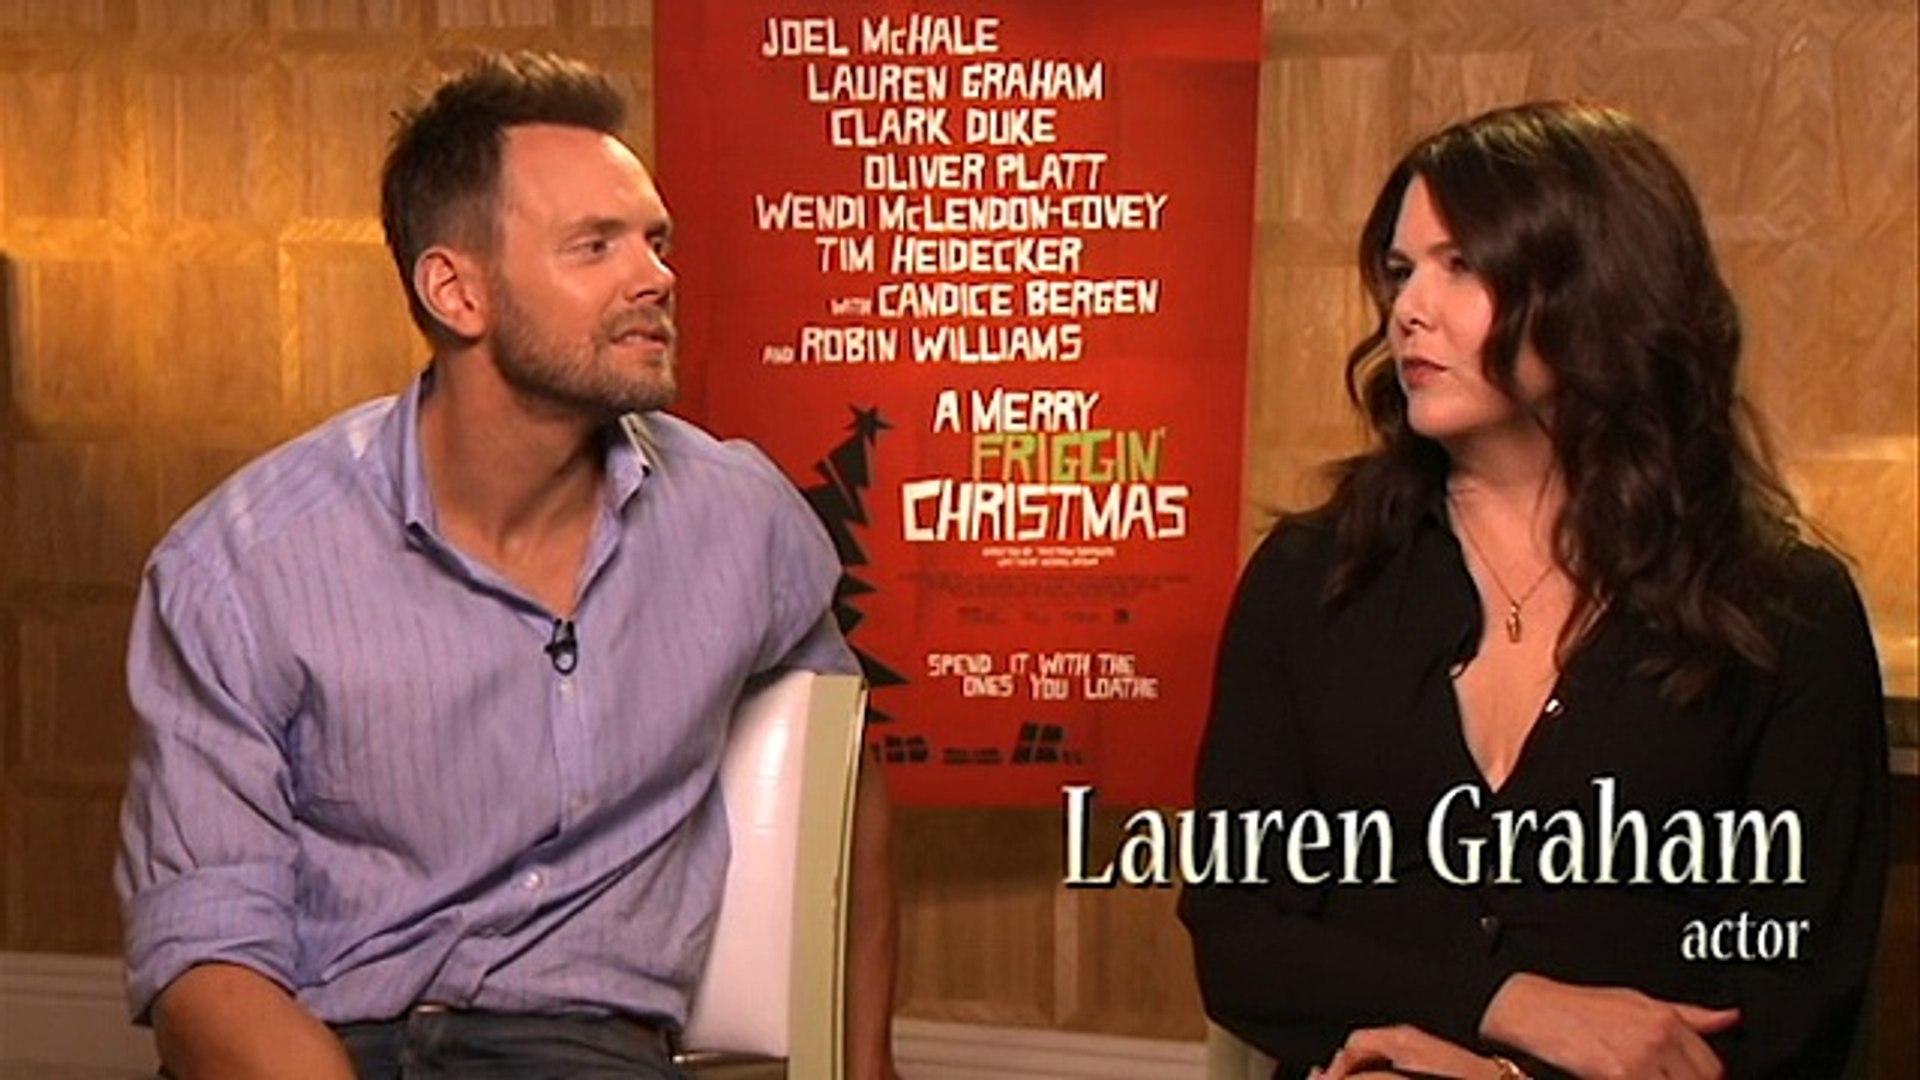 A Merry Friggin Christmas Trailer.Interview Joel Mchale And Lauren Graham